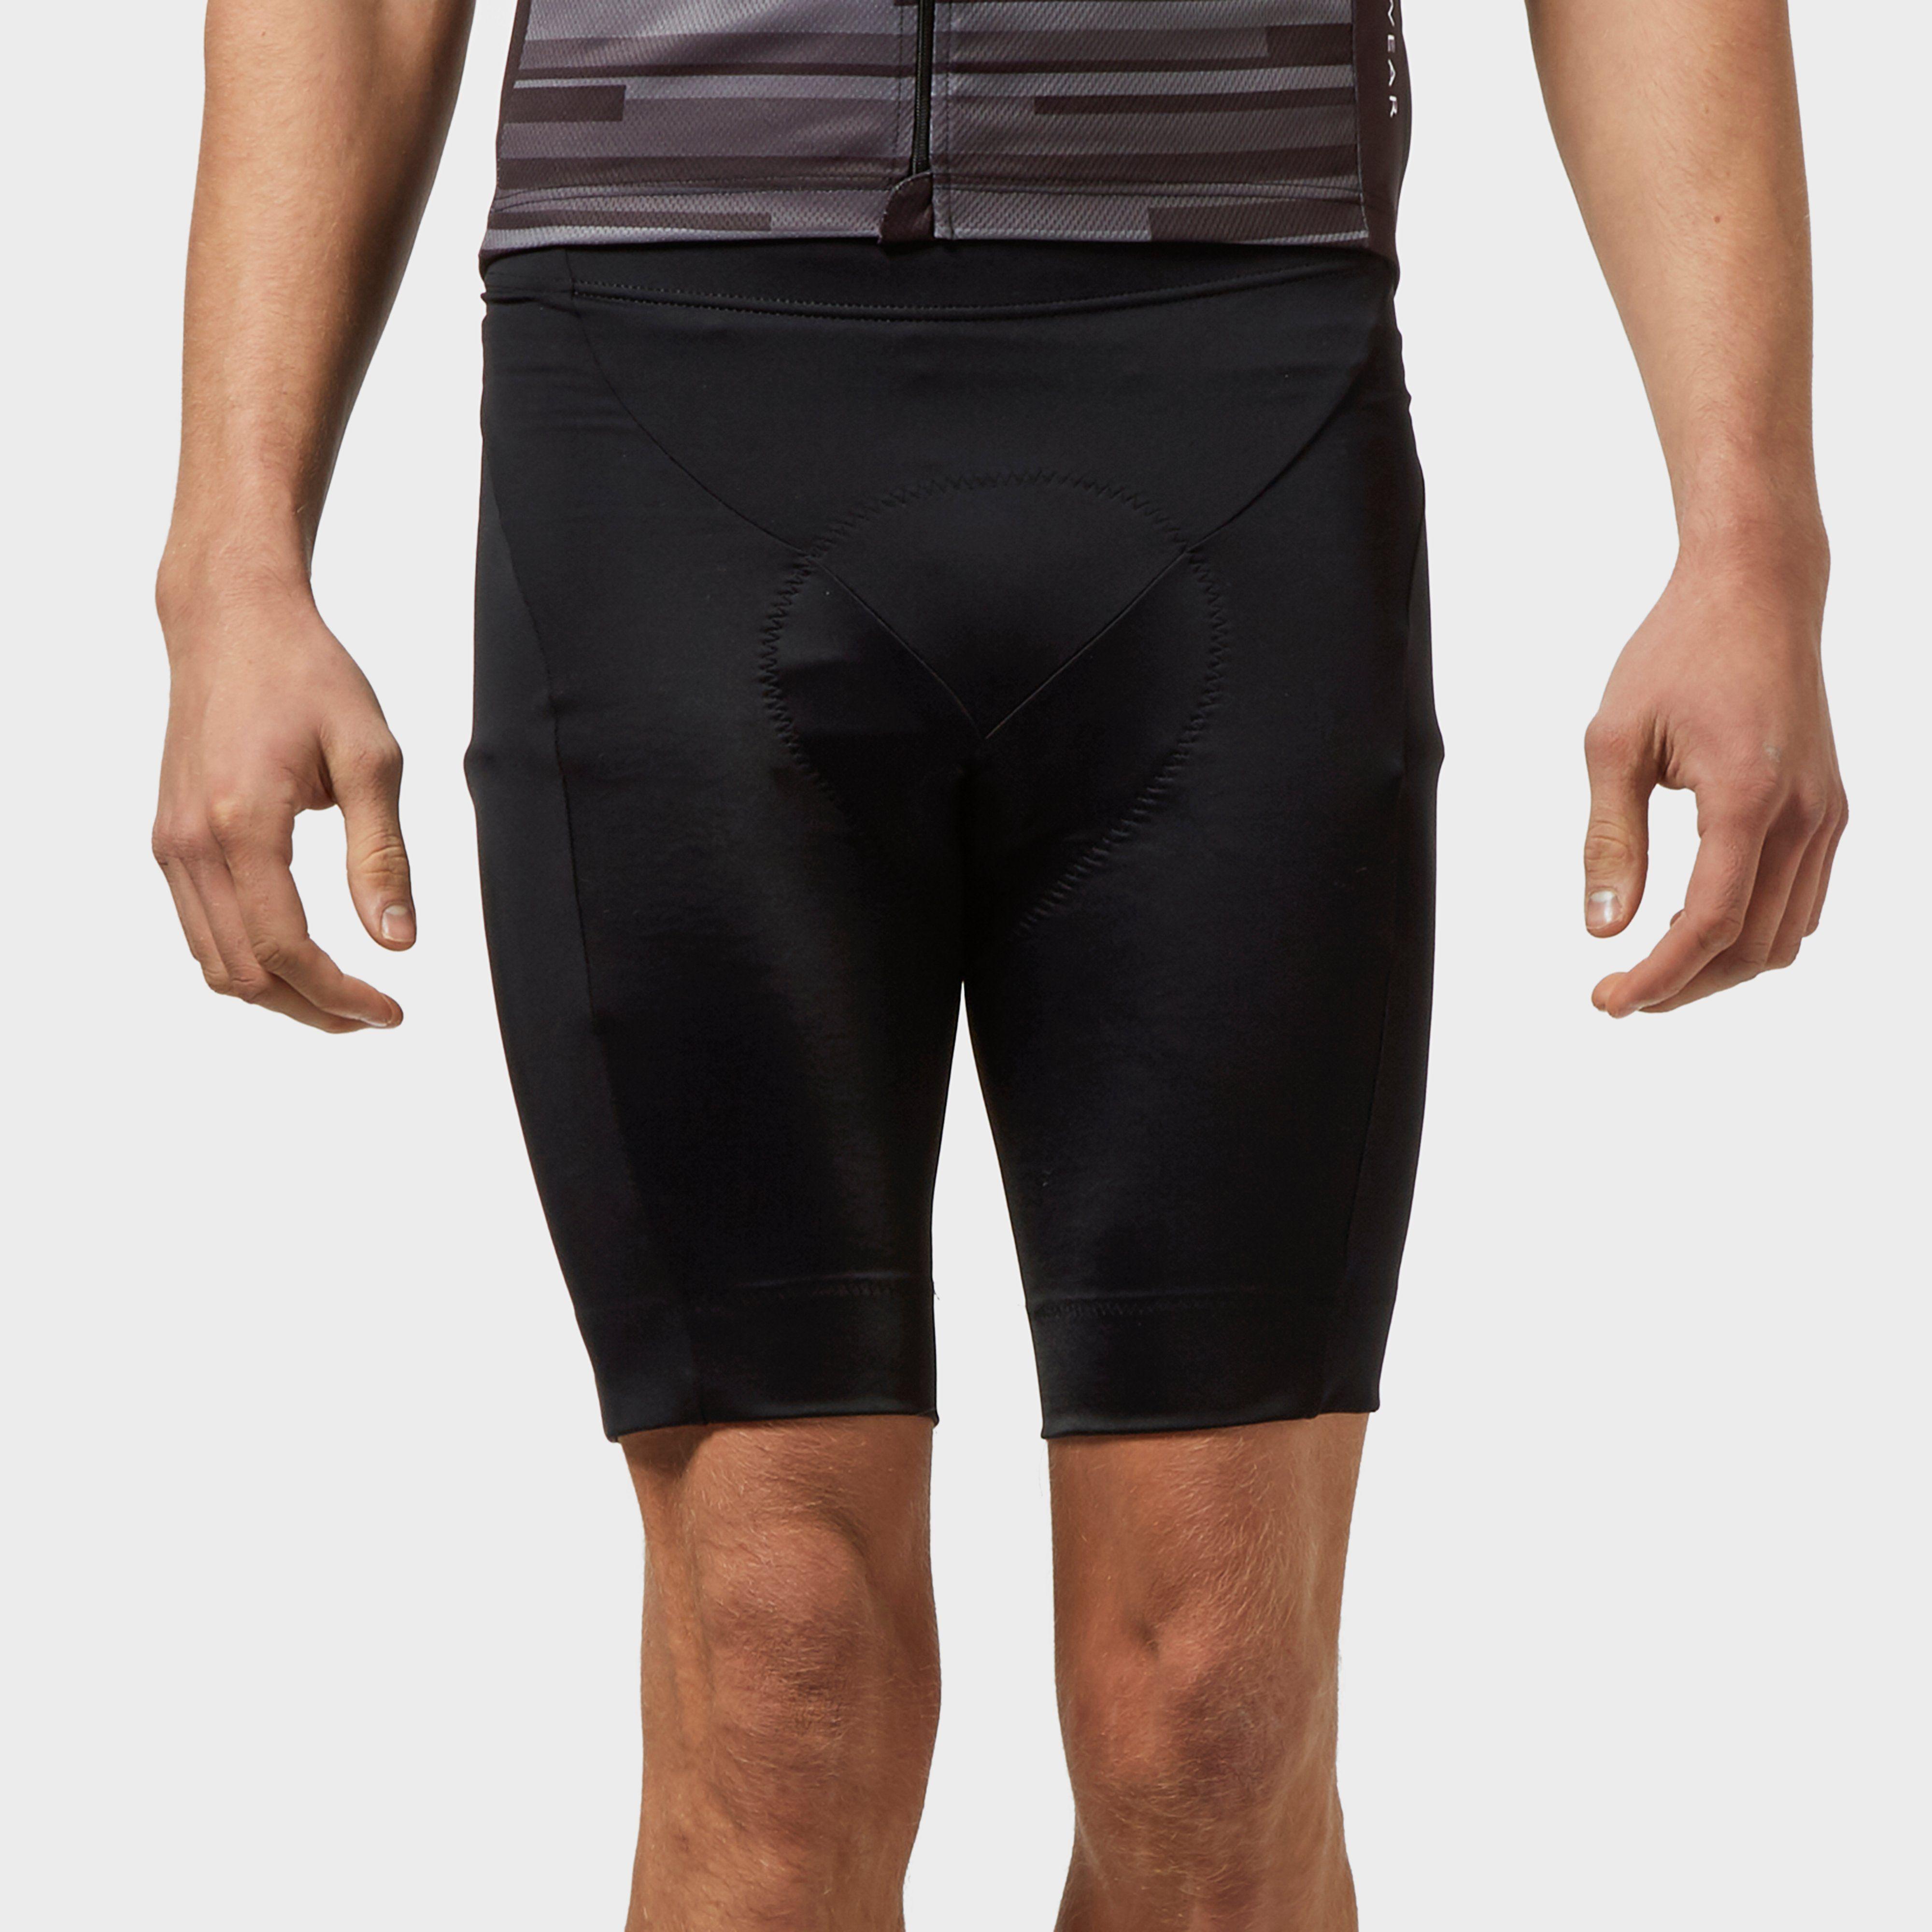 GORE Men's Tight Shorts